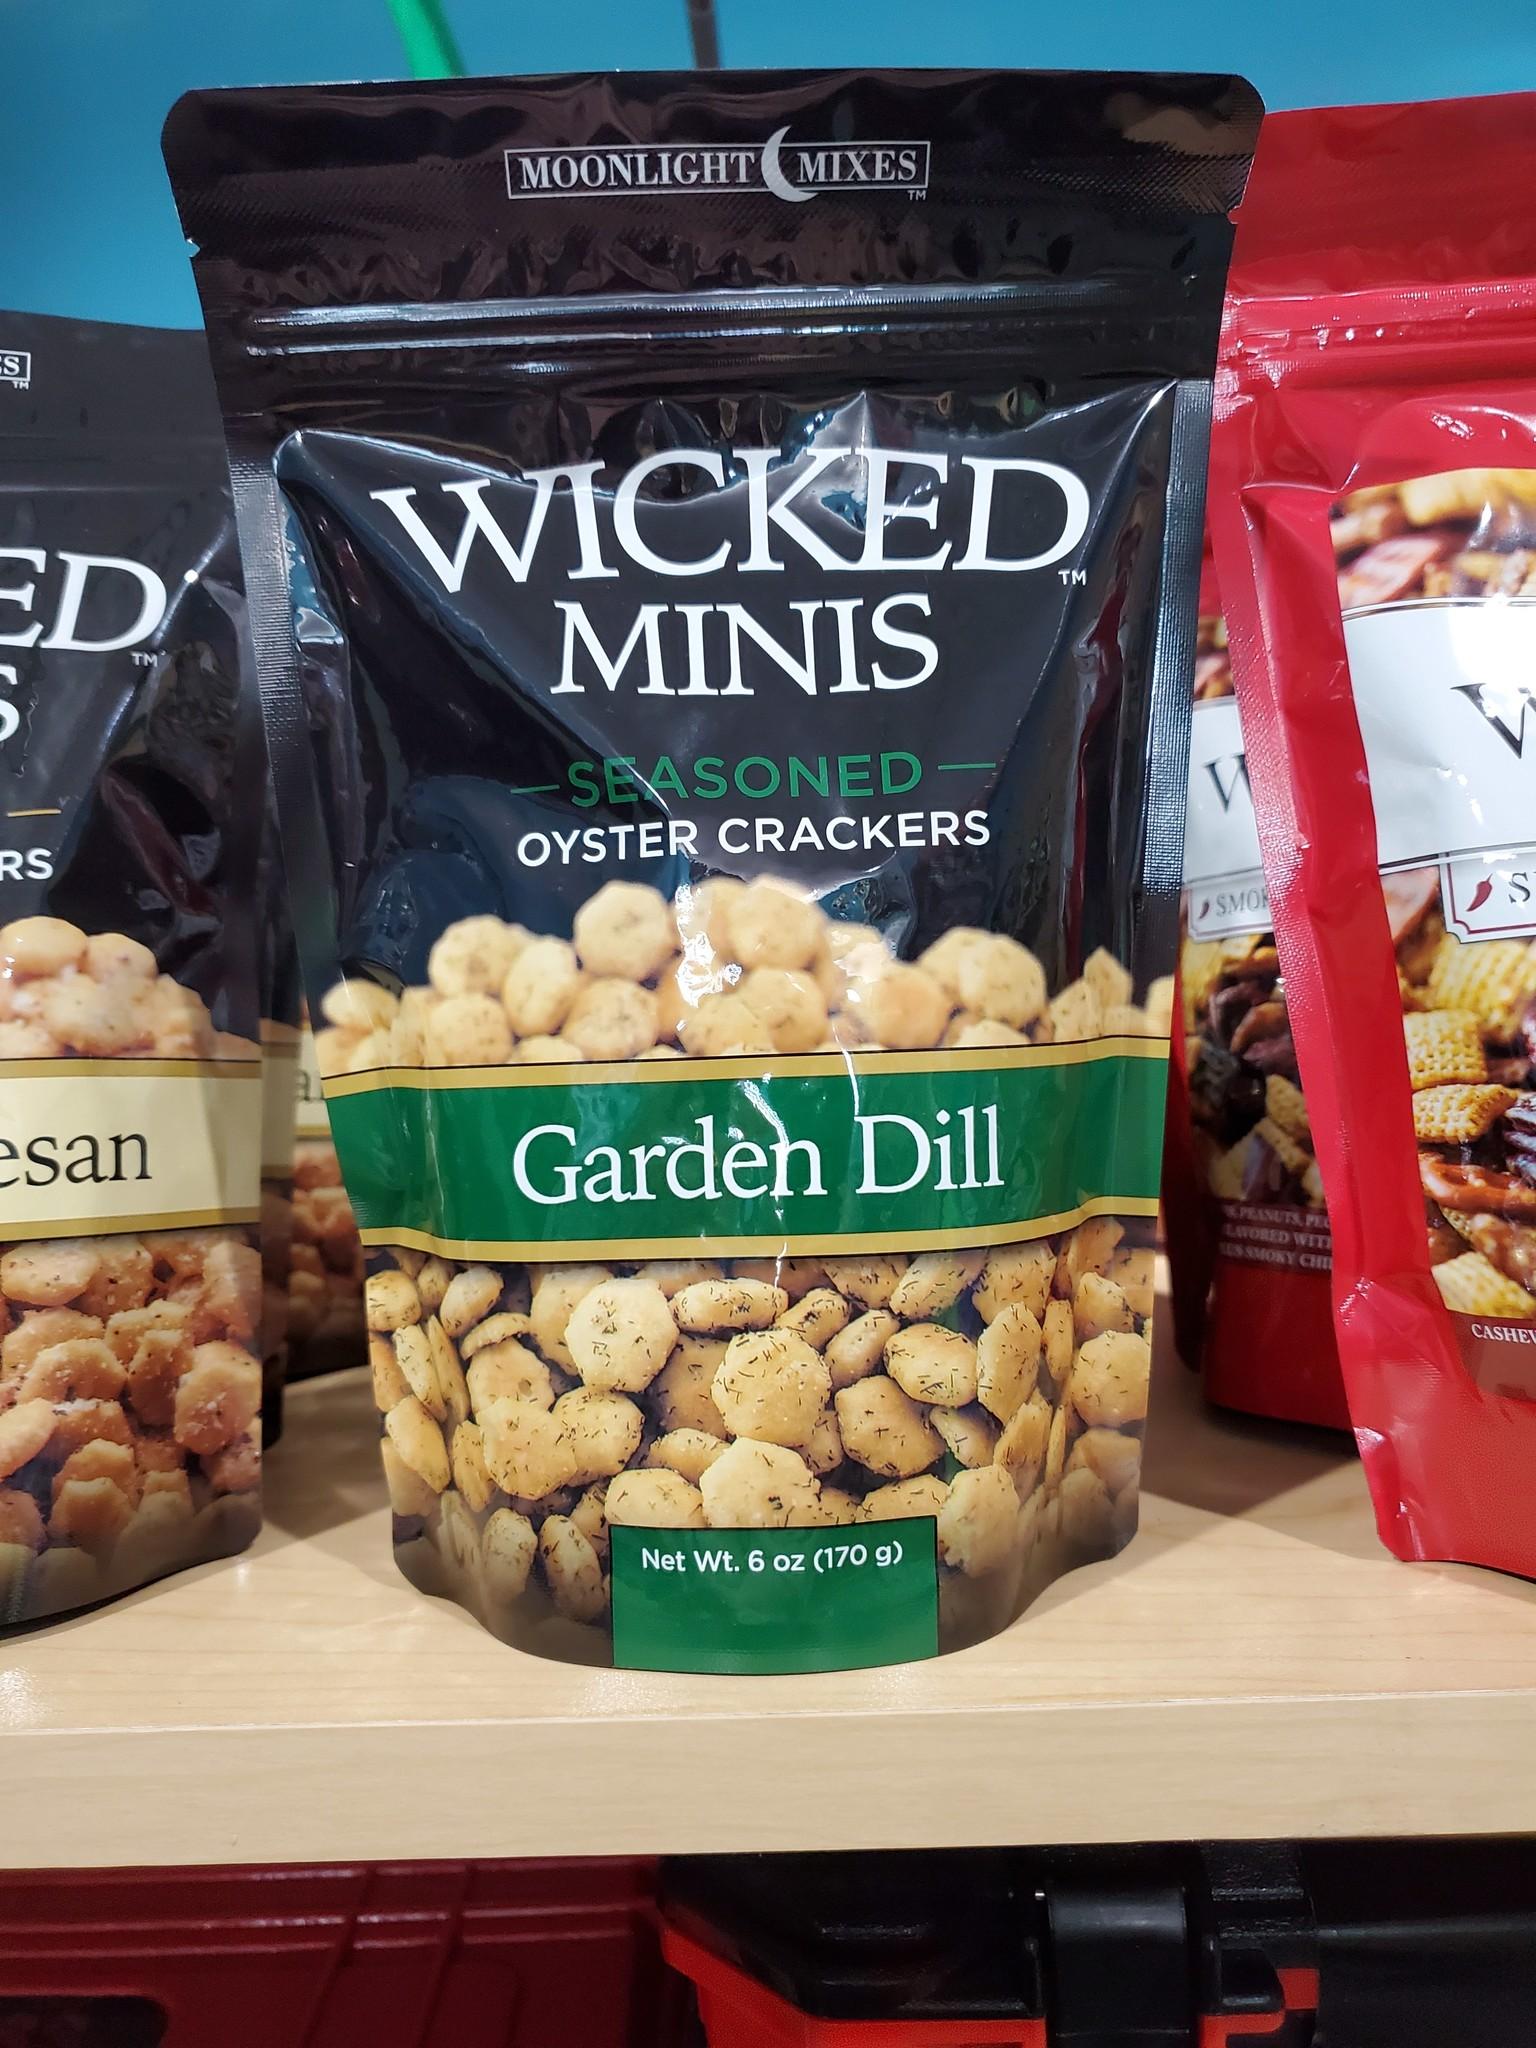 Moonlight Mixes Wicked Minis Garden Dill